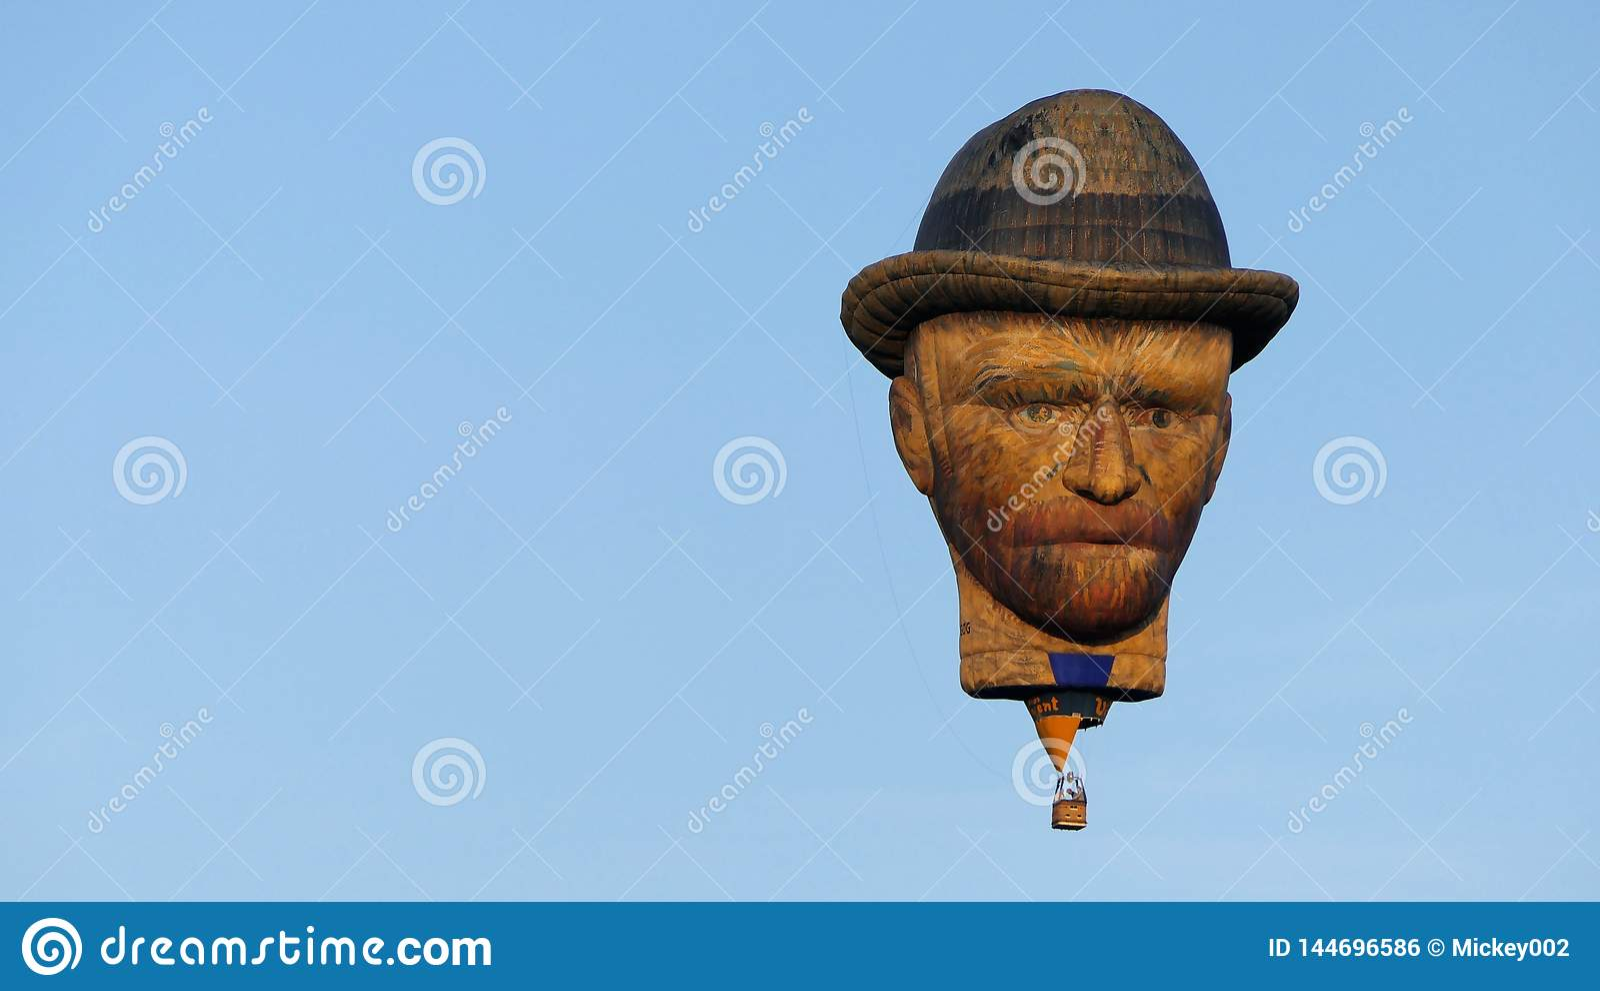 Balloon Vincent